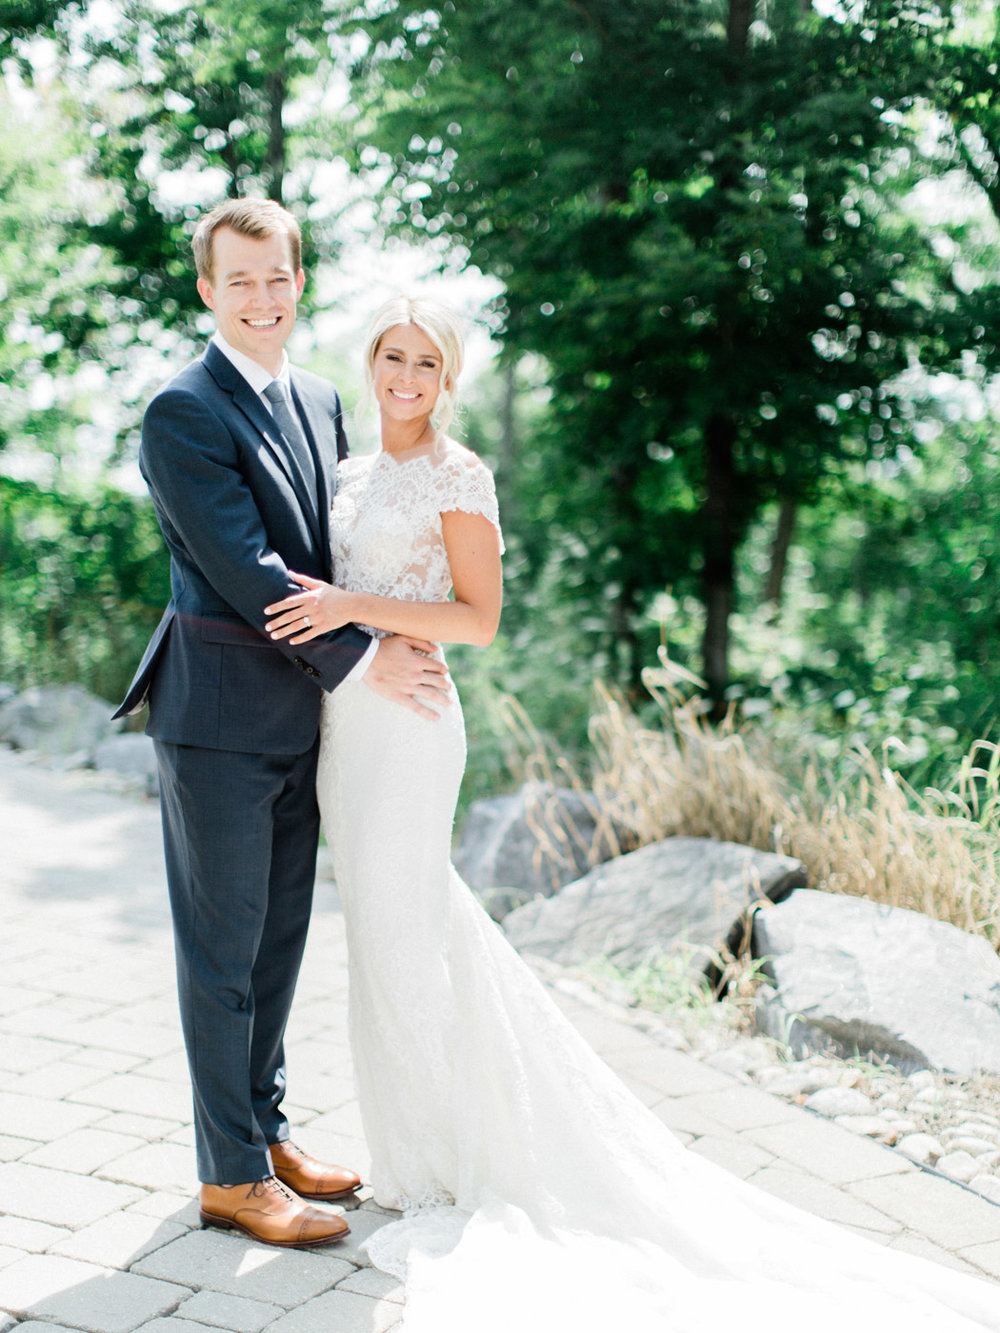 Toronto-Muskoka-wedding-photographer-summery-fun-documentary-the-marriott-rosseau38.jpg